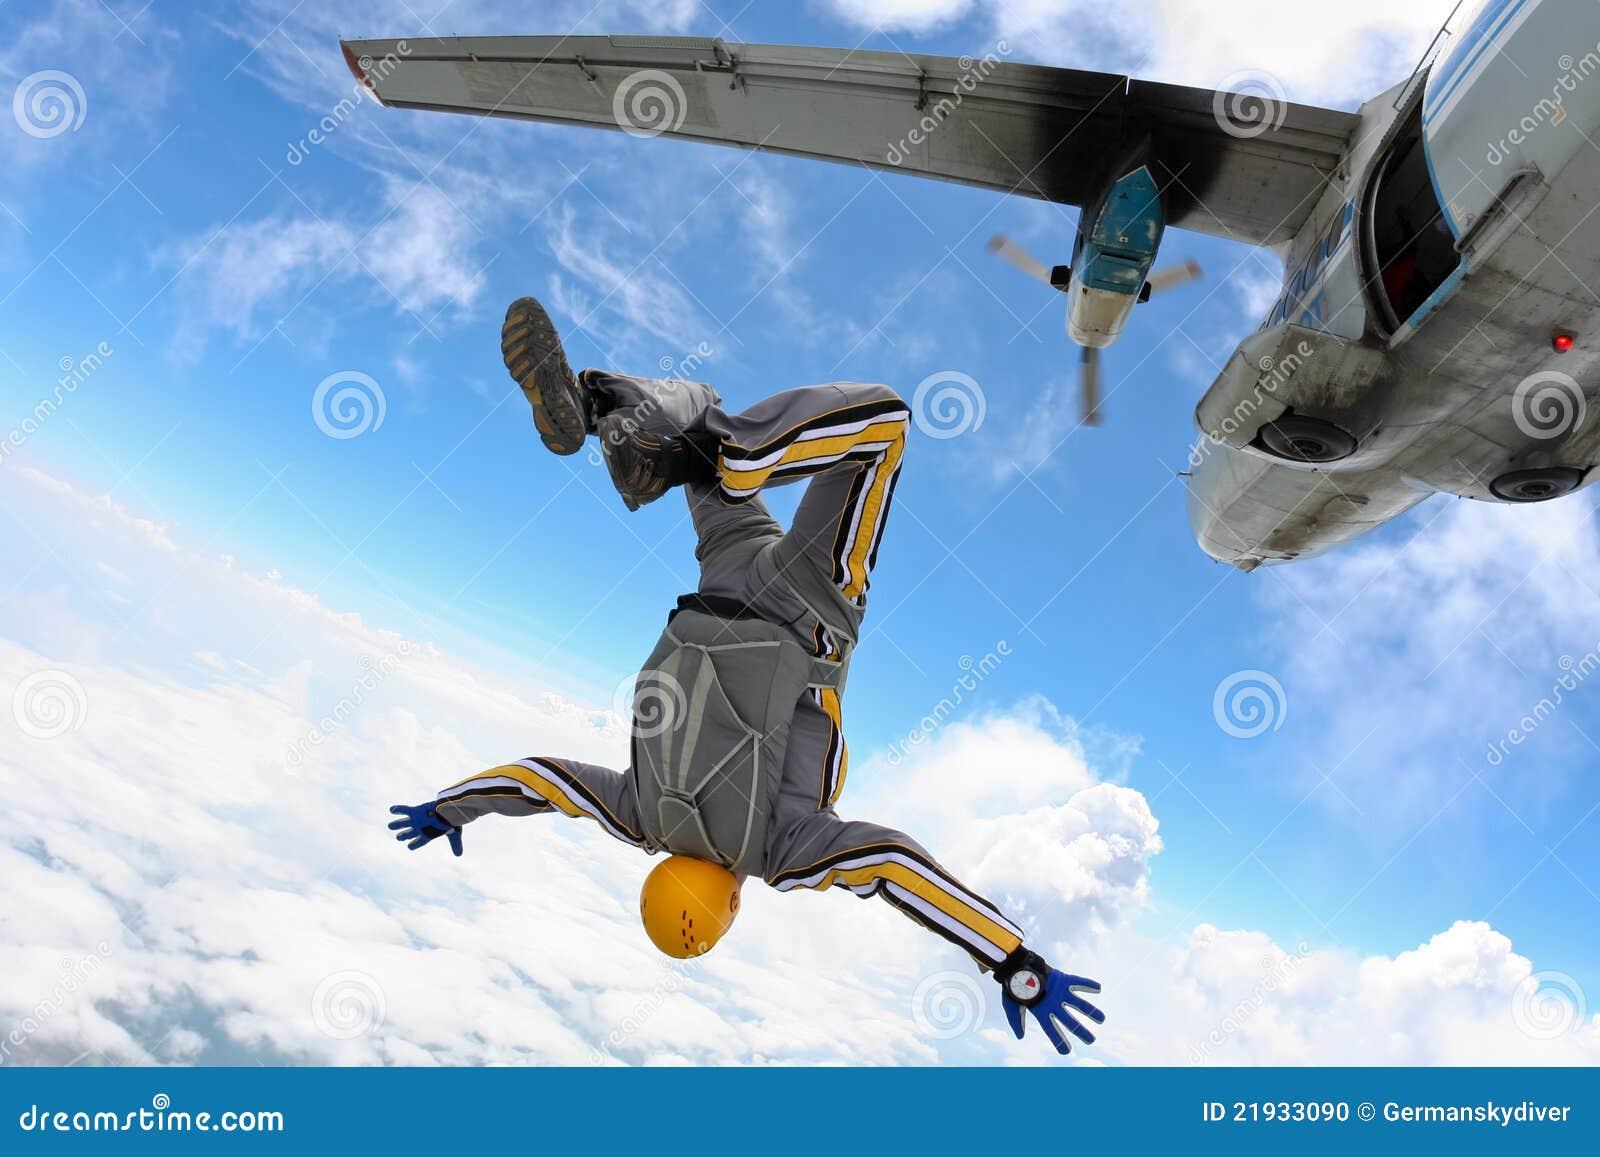 Foto de Skydiving